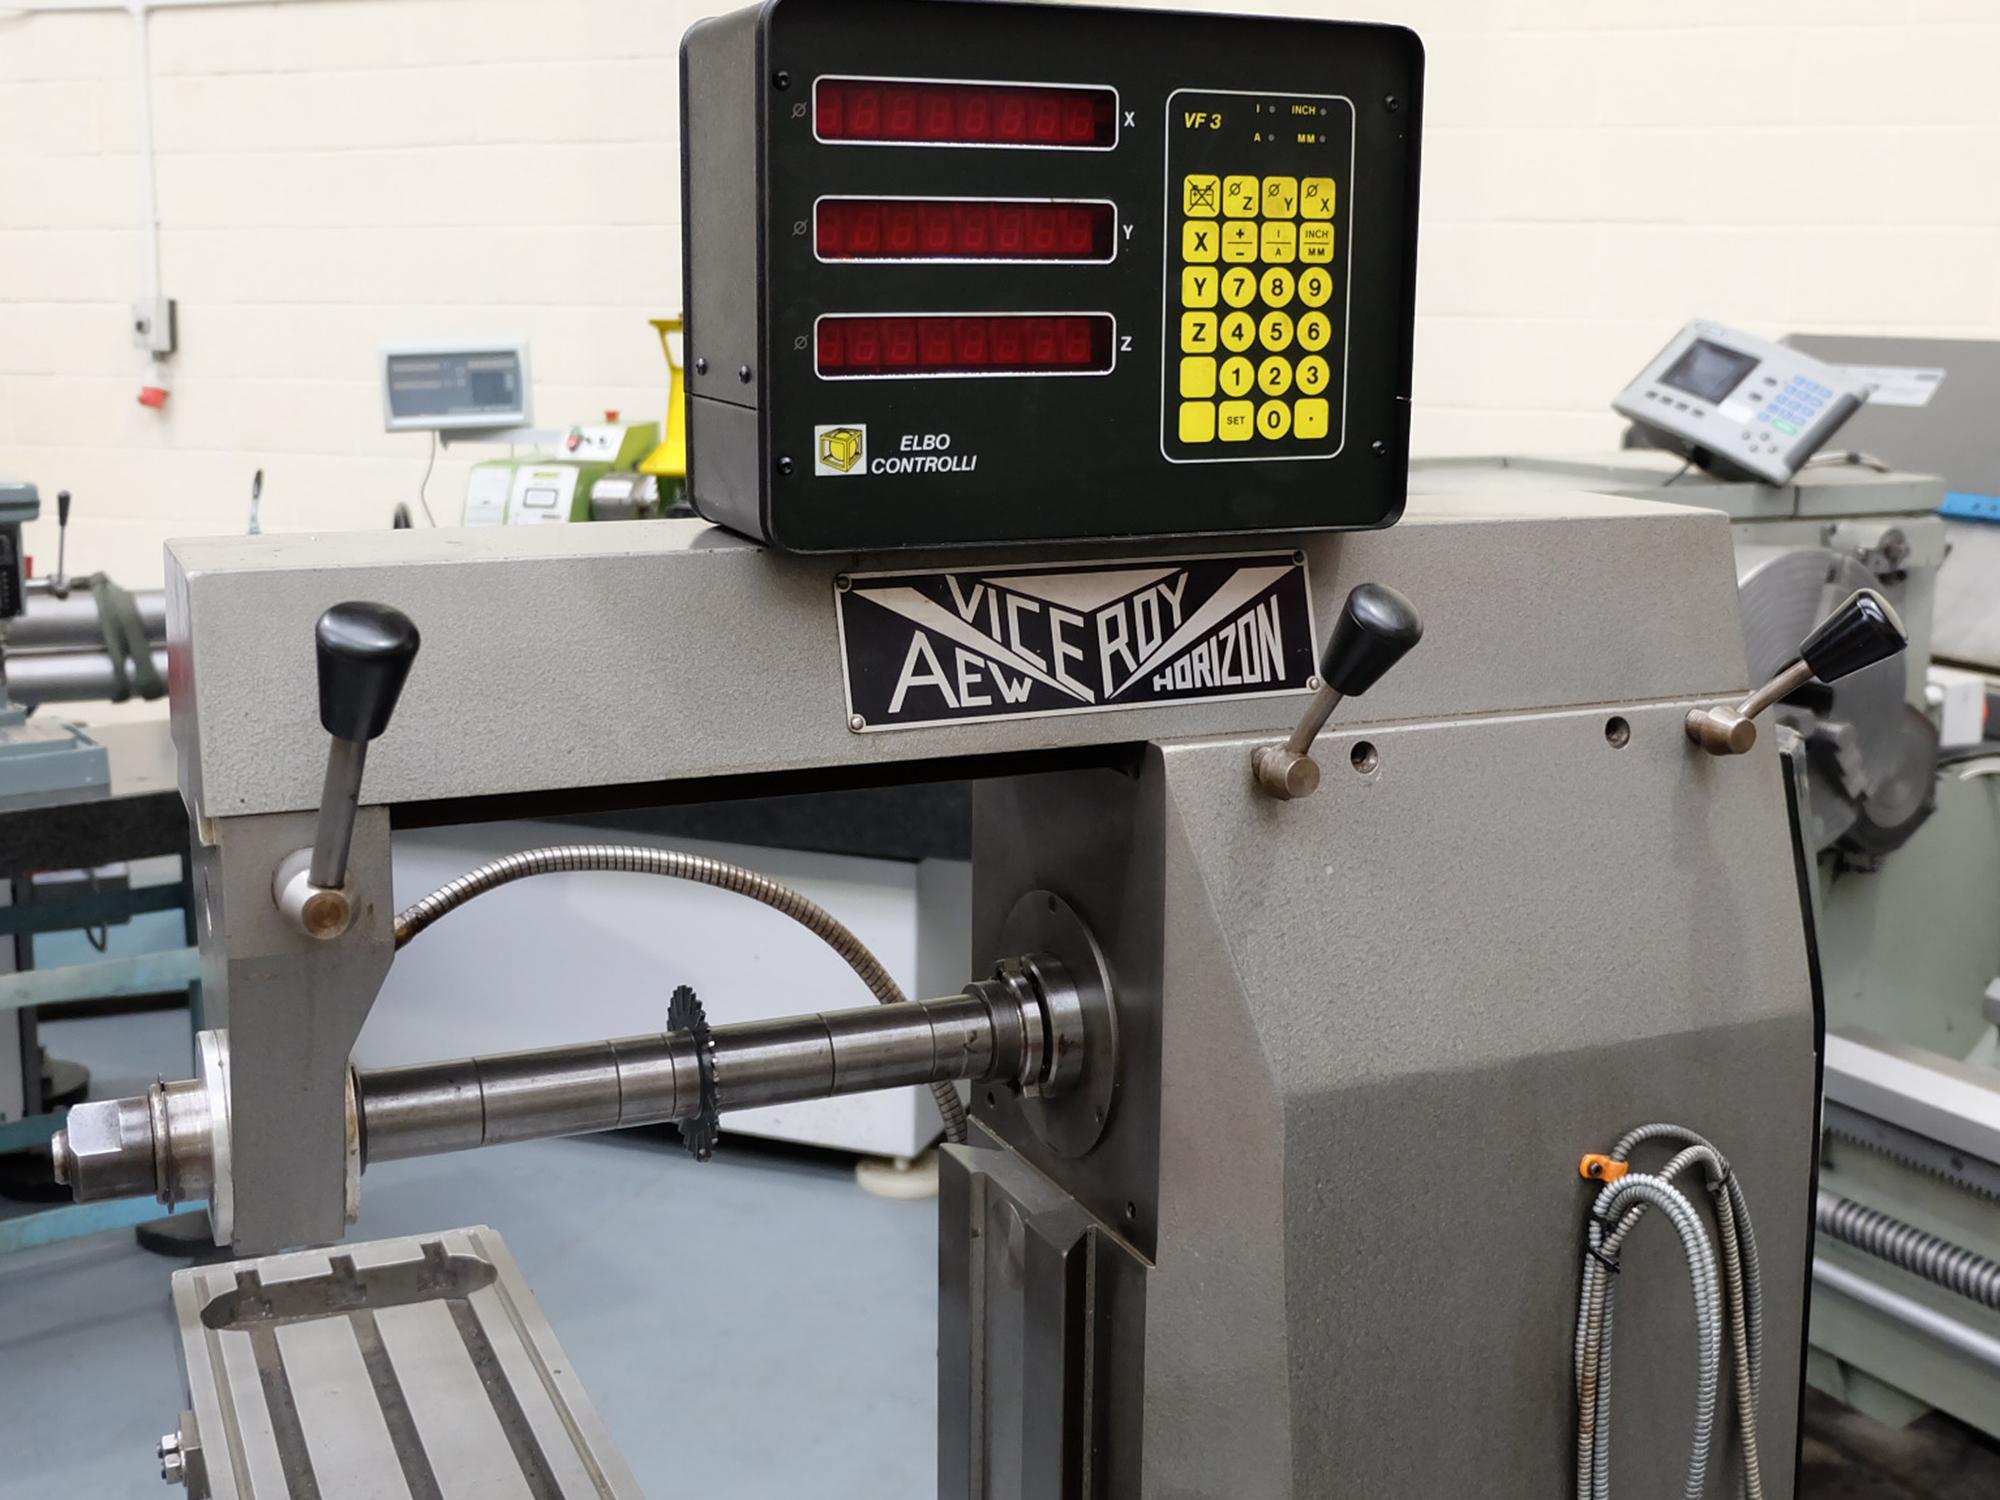 Veceroy AEW: Horizontal Milling Machine. - Image 3 of 10